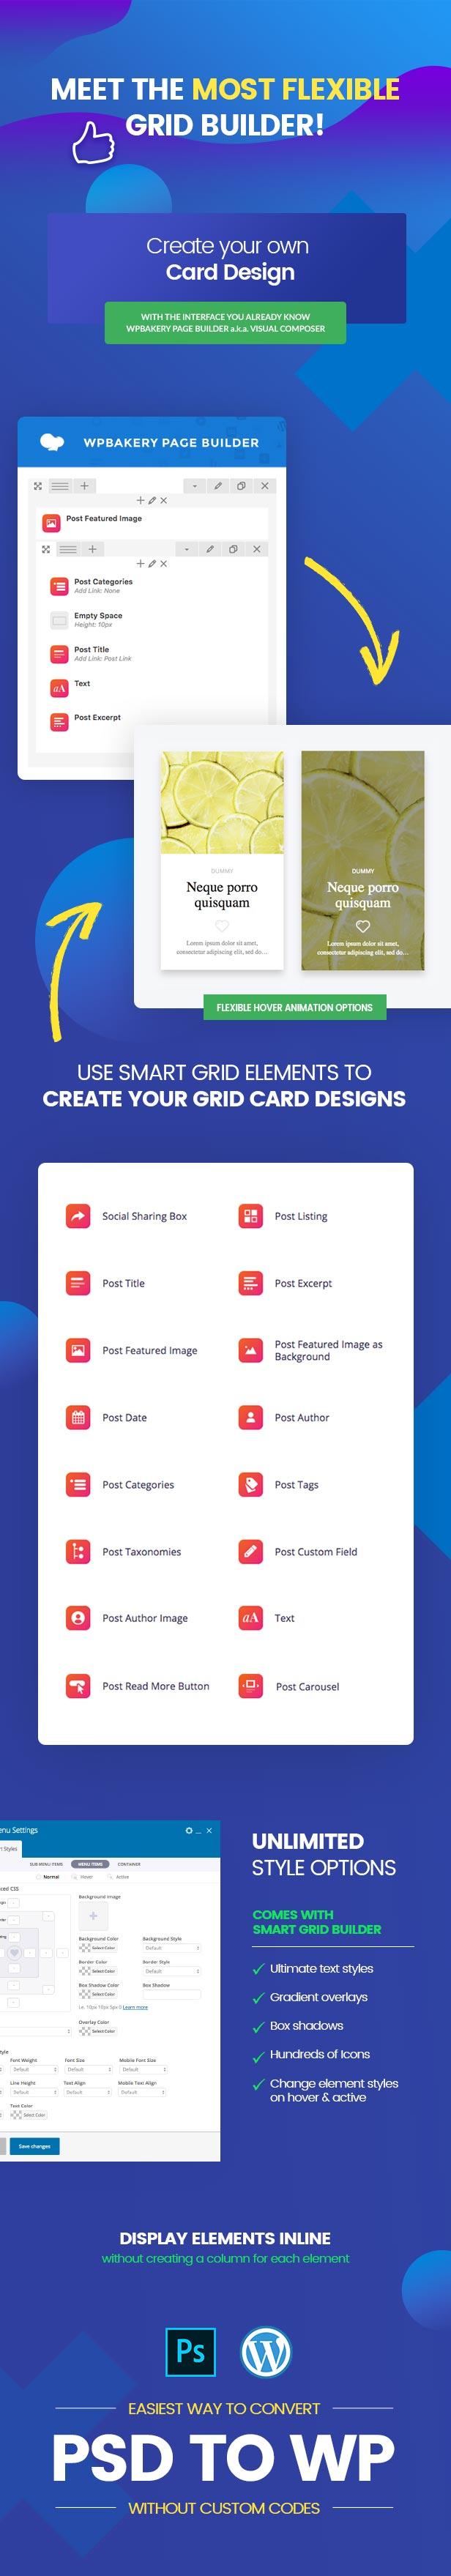 smart_grid_builder_slice_3.jpg